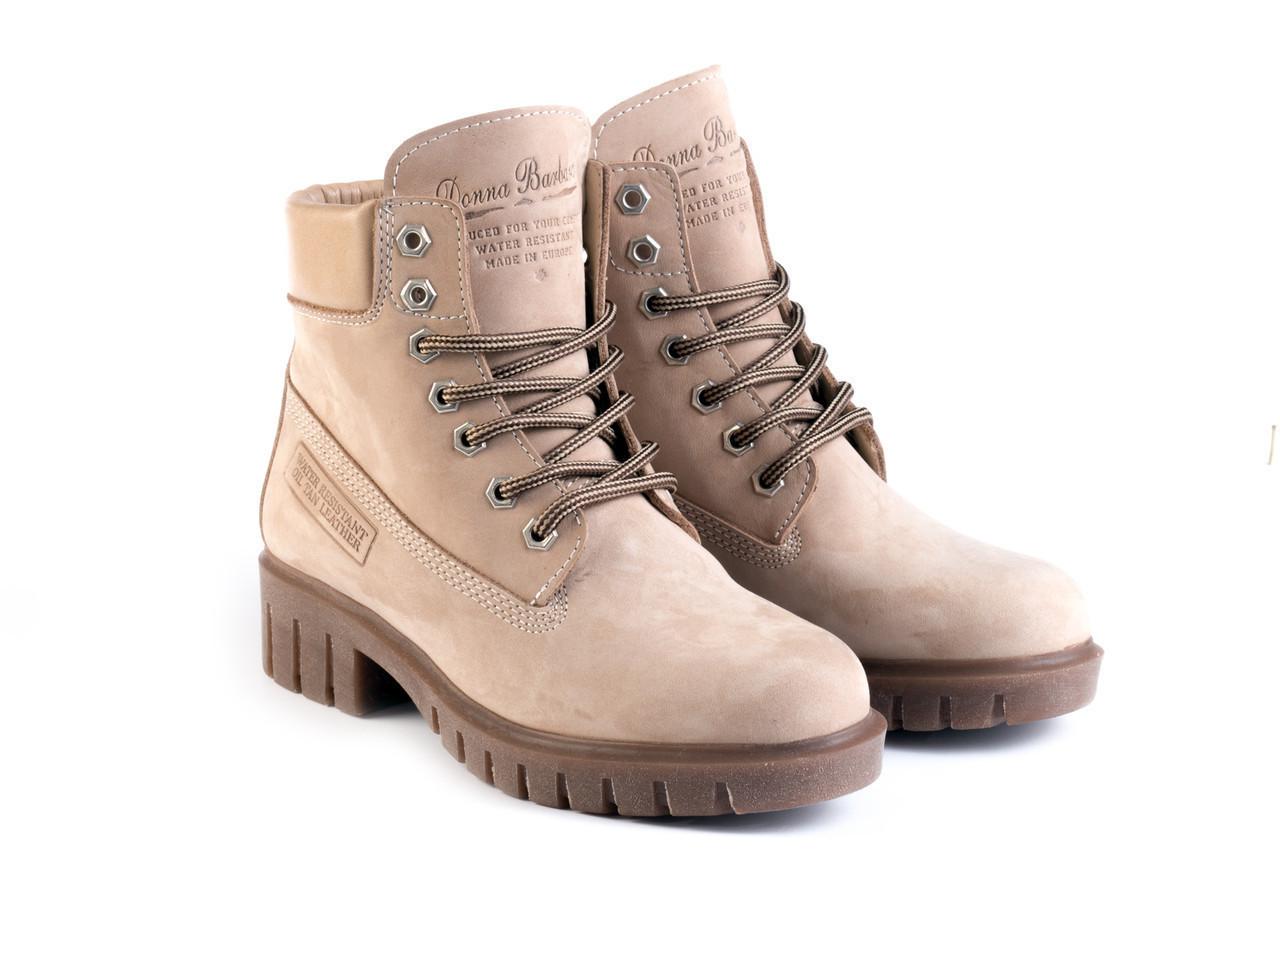 Ботинки Etor 5169-021554-832 40 бежевые, фото 1